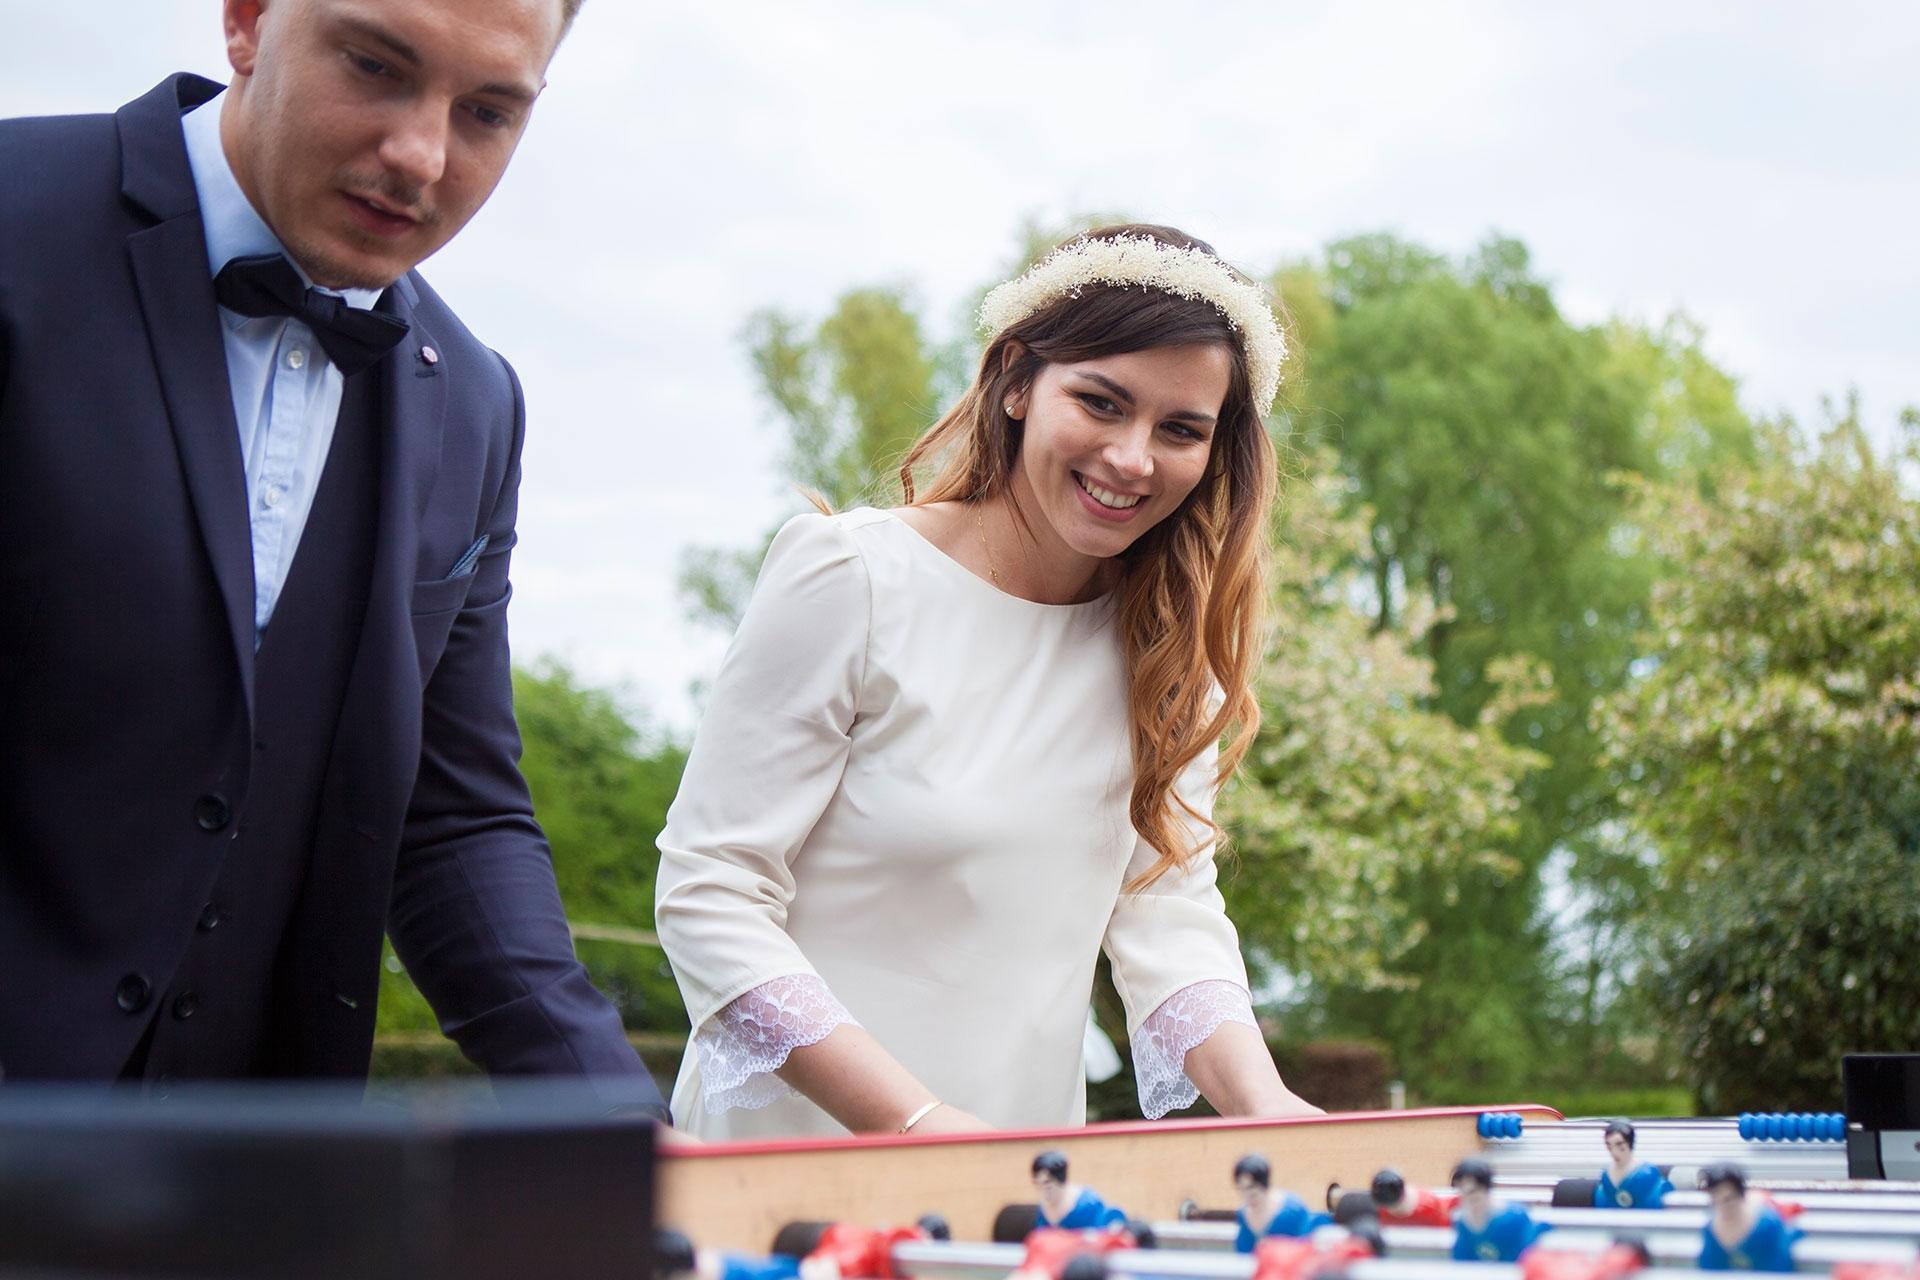 particuliers-evenements-mariages-oui-zelie&valentin-51